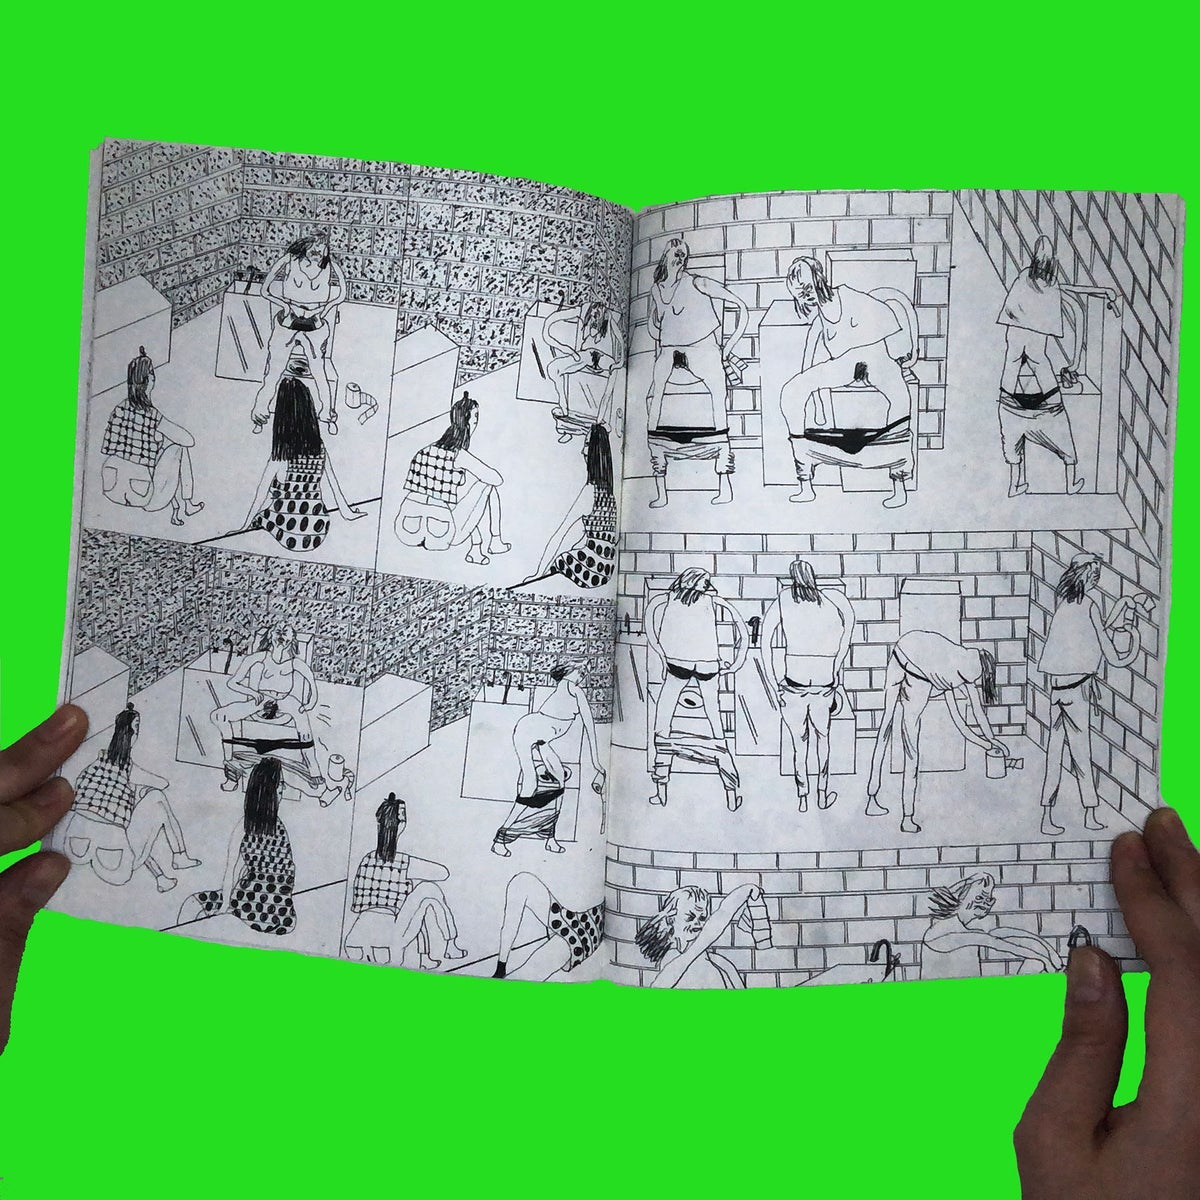 Image of D.U.I by Tara Booth